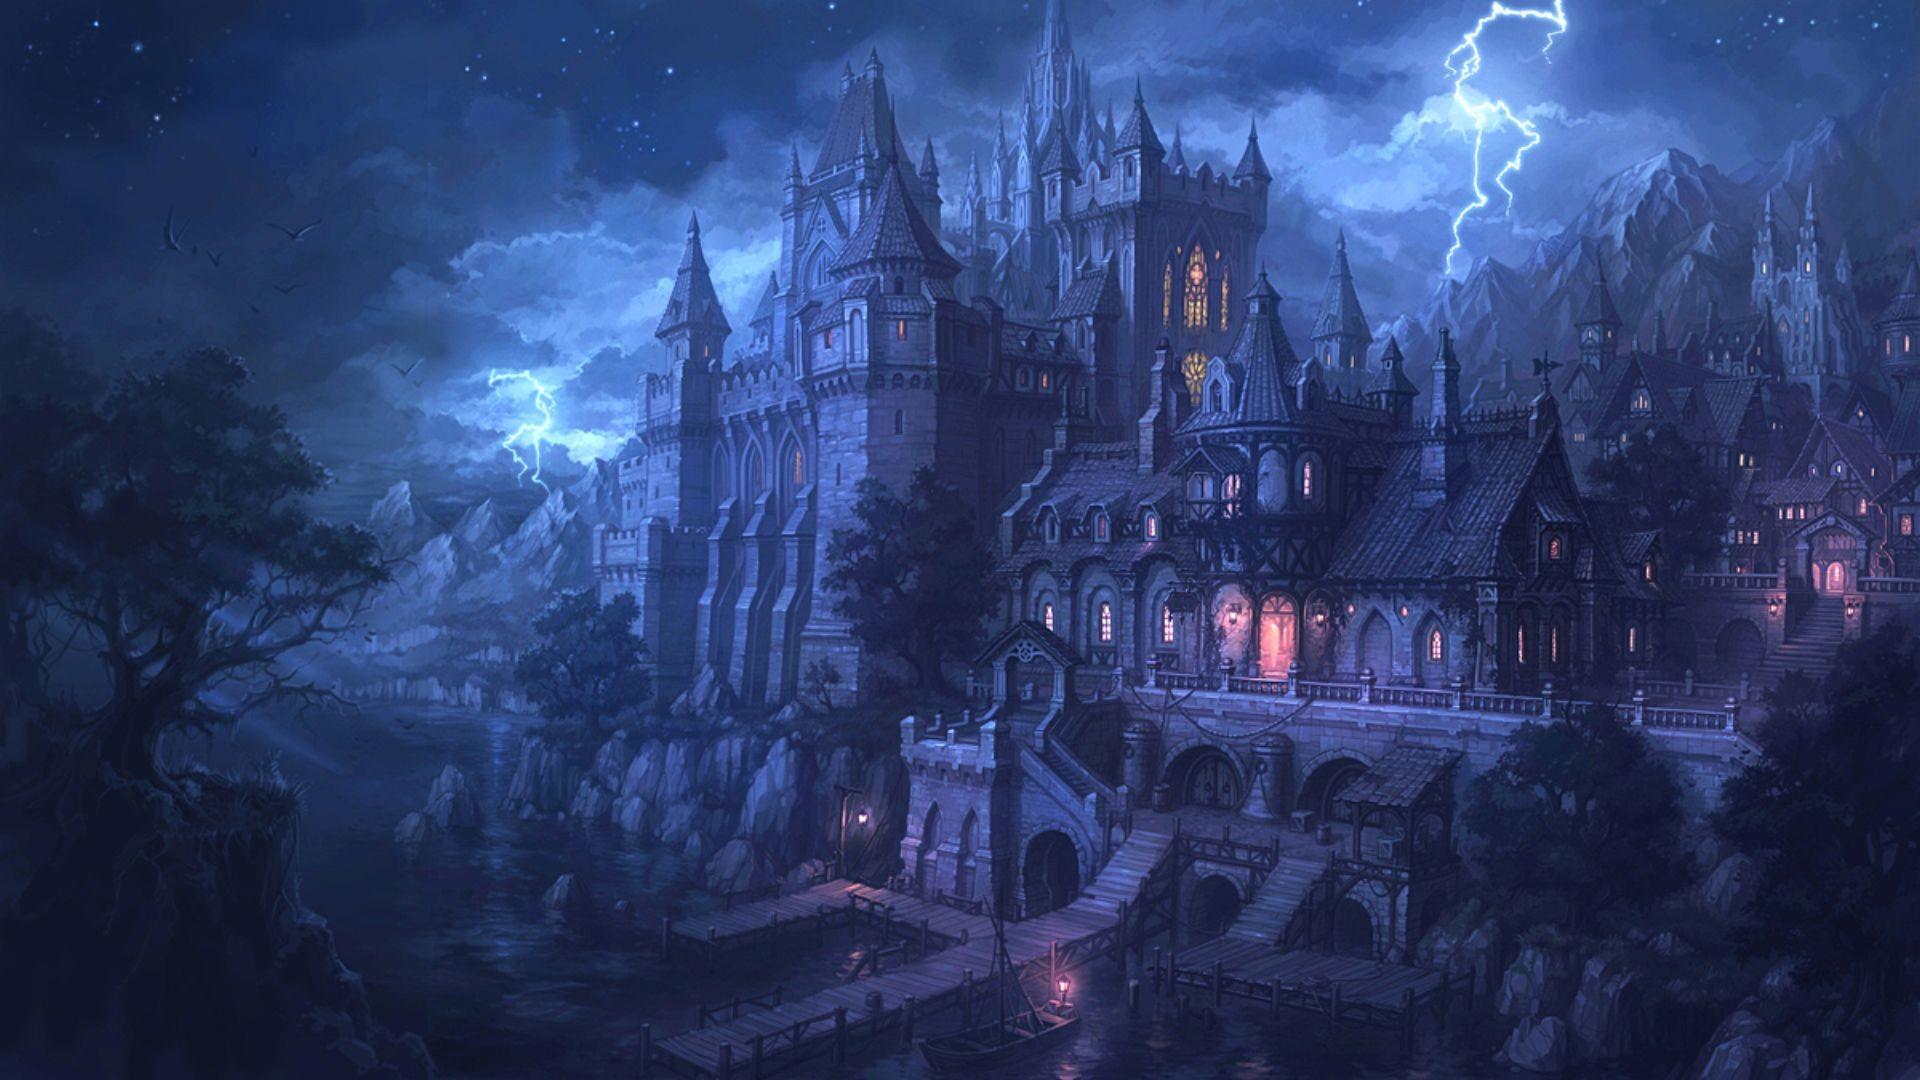 Fantasy – Castle Wallpaper